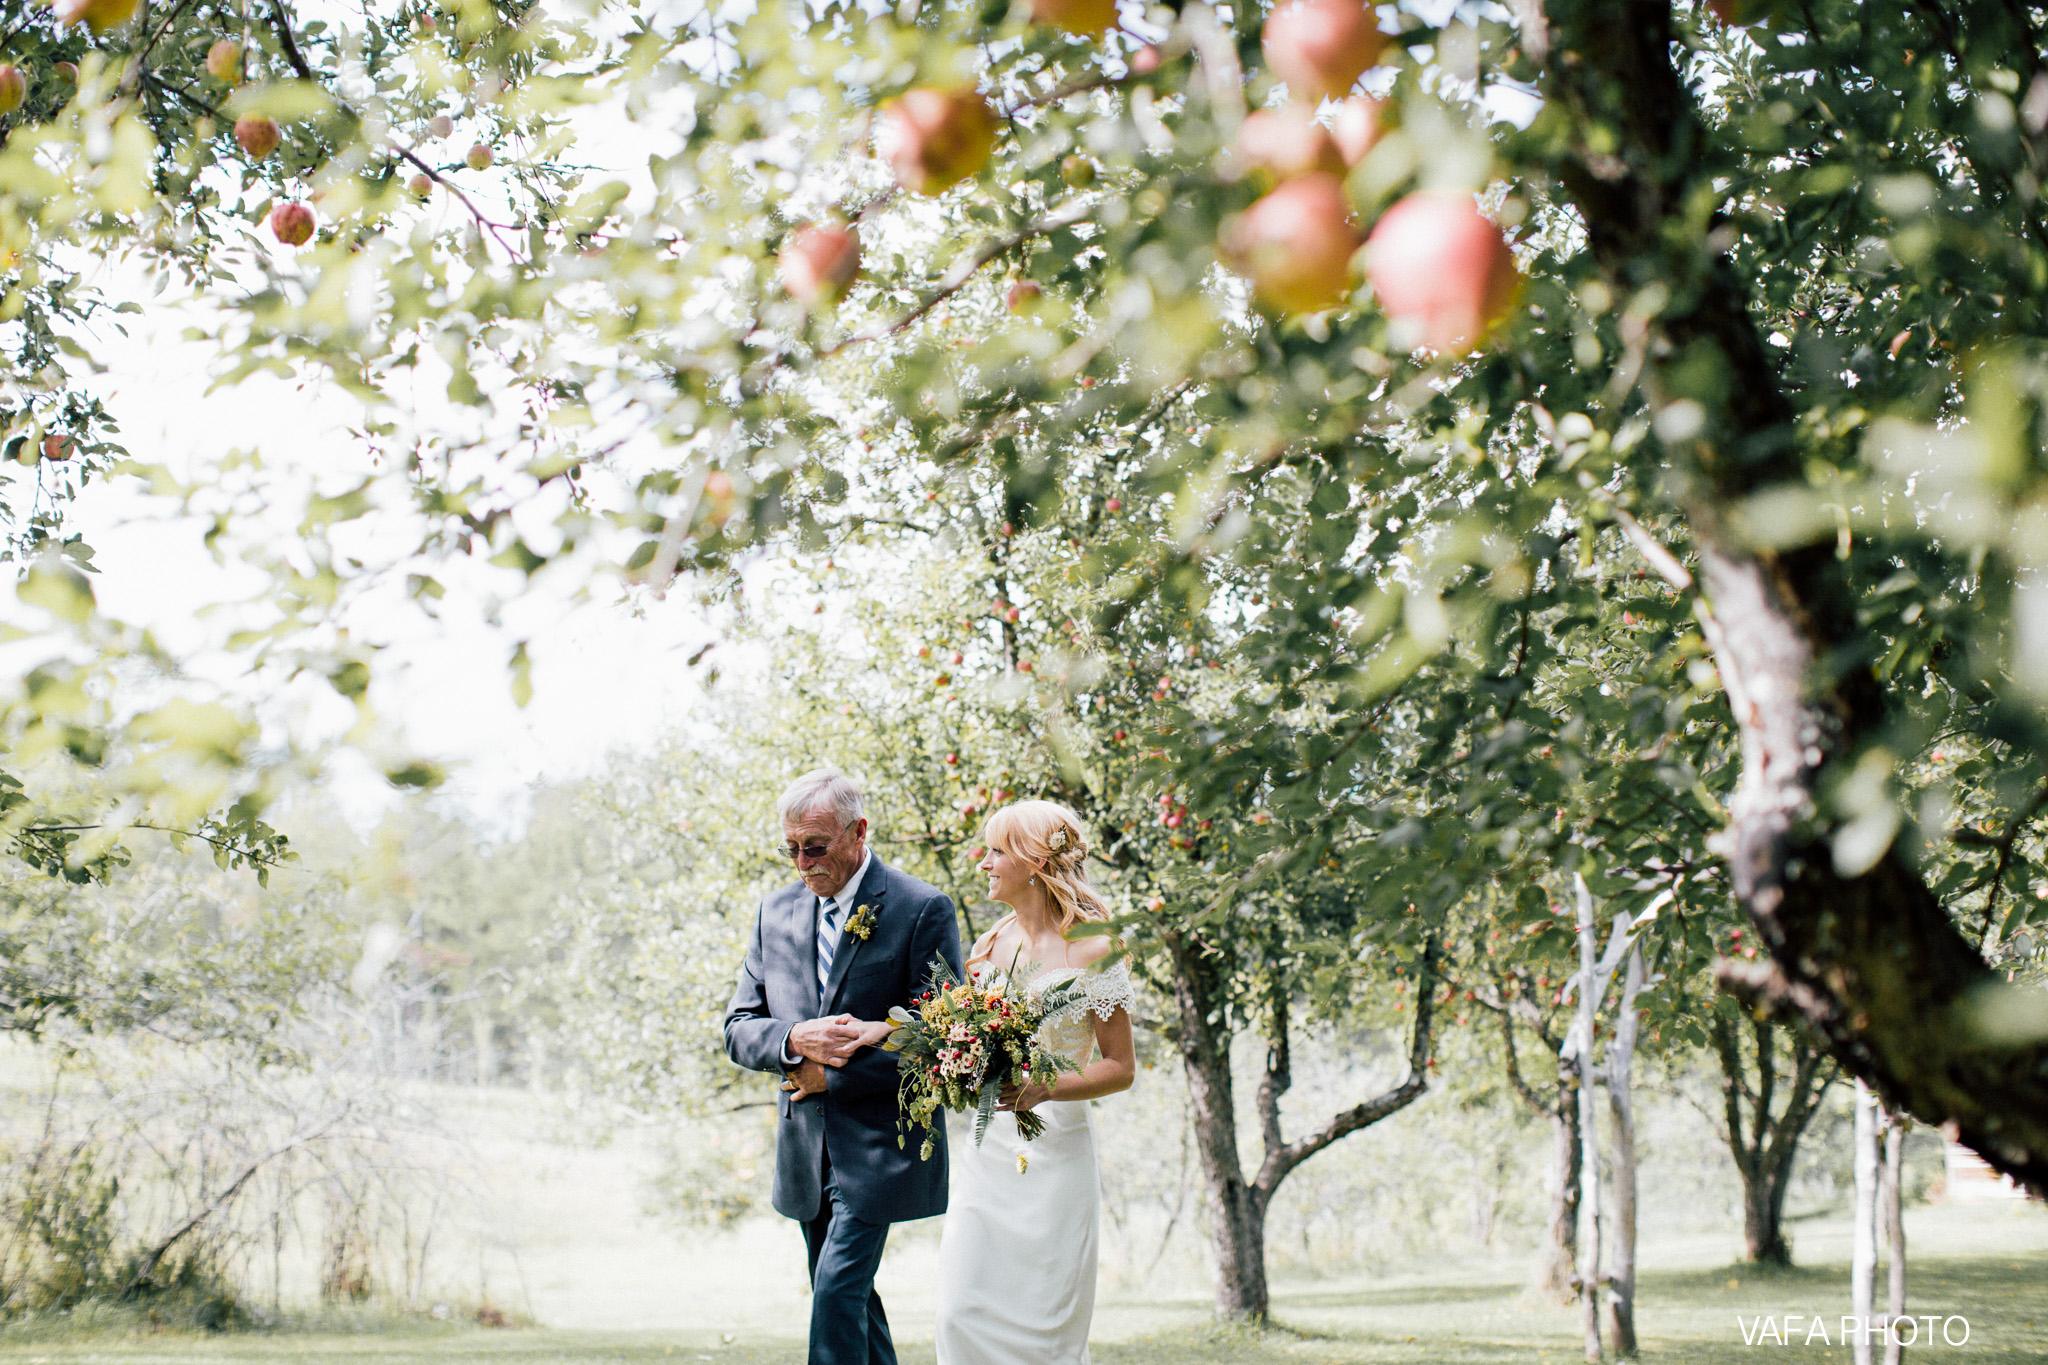 Belsolda-Farm-Wedding-Christy-Eric-Vafa-Photo-403.jpg